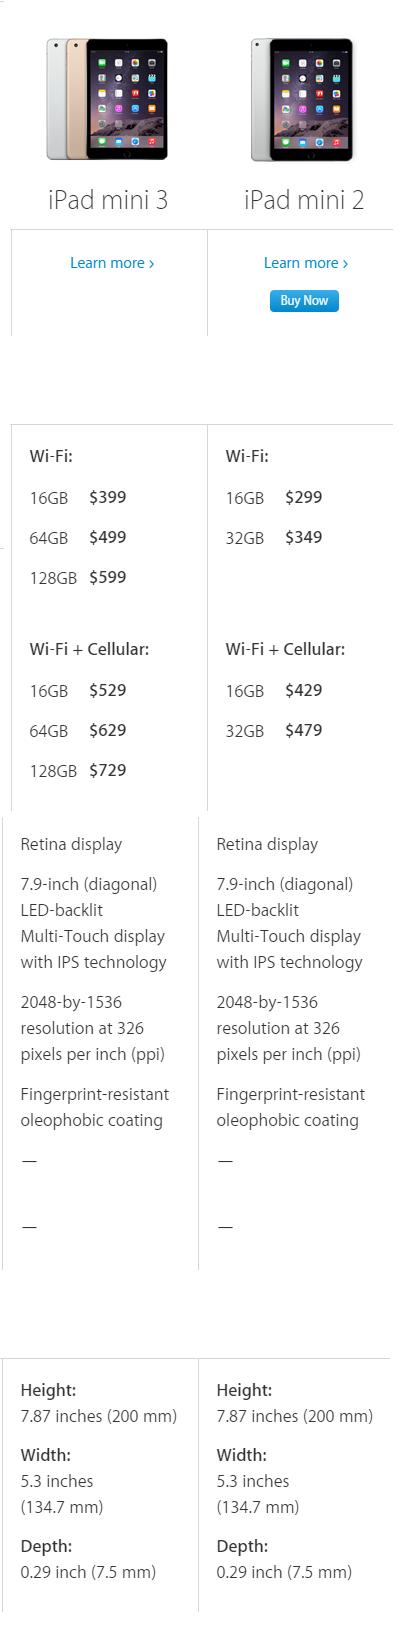 ipad mini 3 versus ipad mini 2